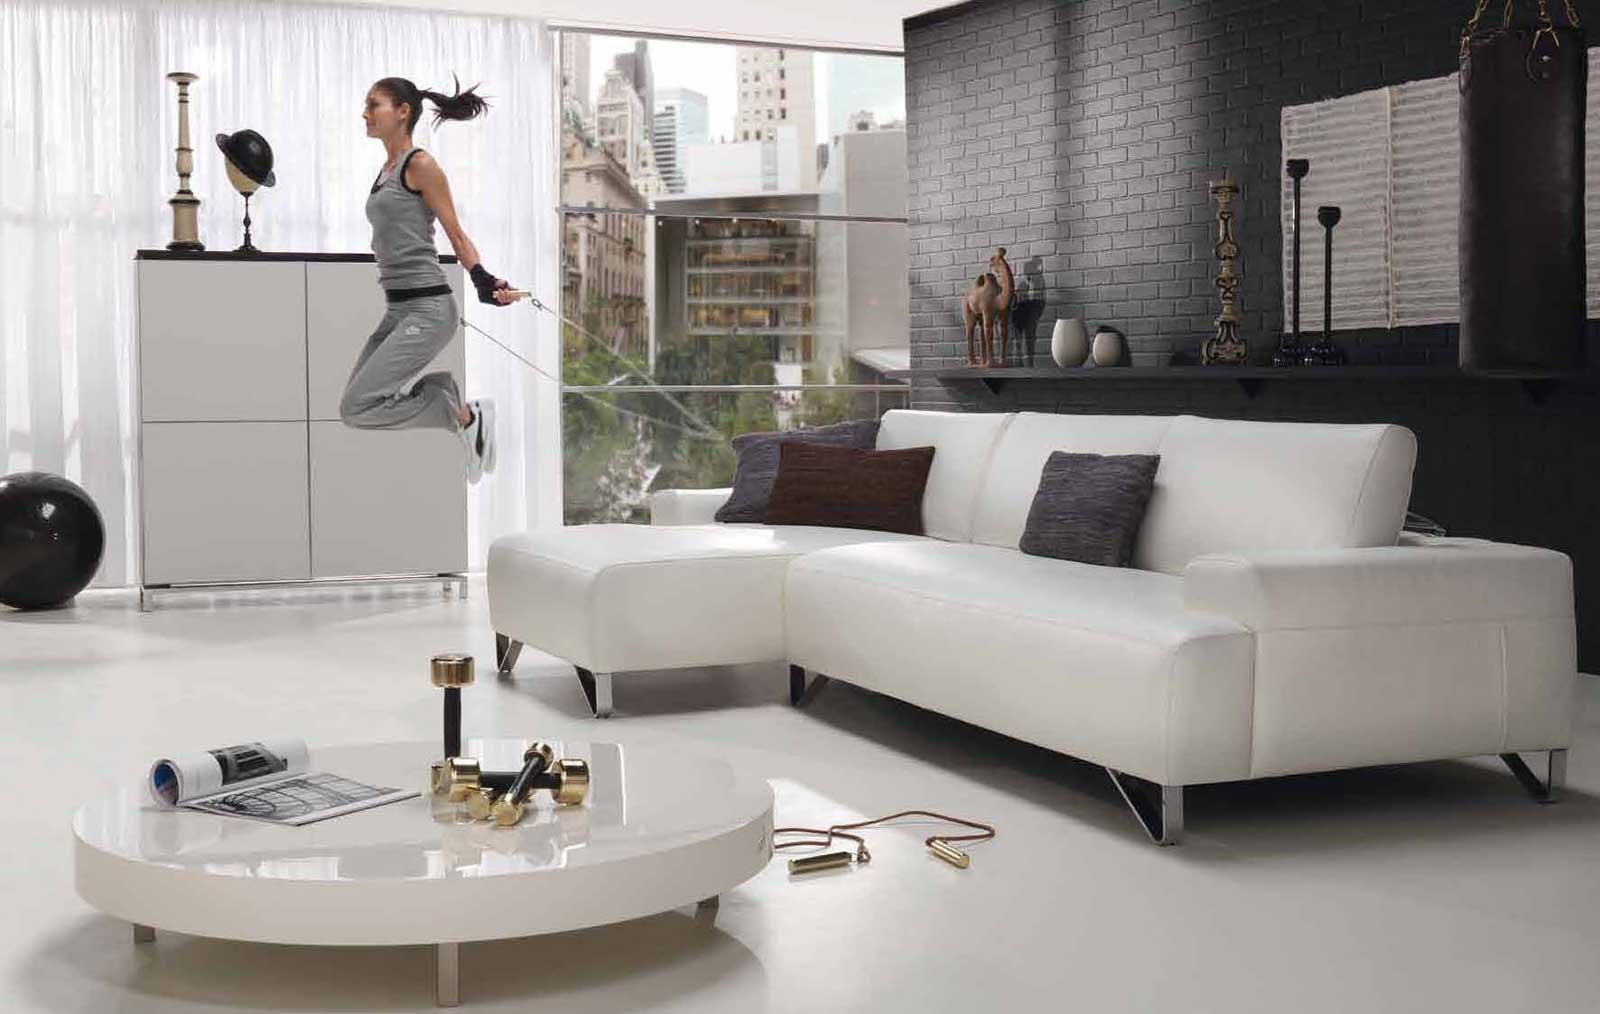 Contemporary Sofas for Home Interior awesome modern interior design ideas with spacious white room decor and  white DVVKITB